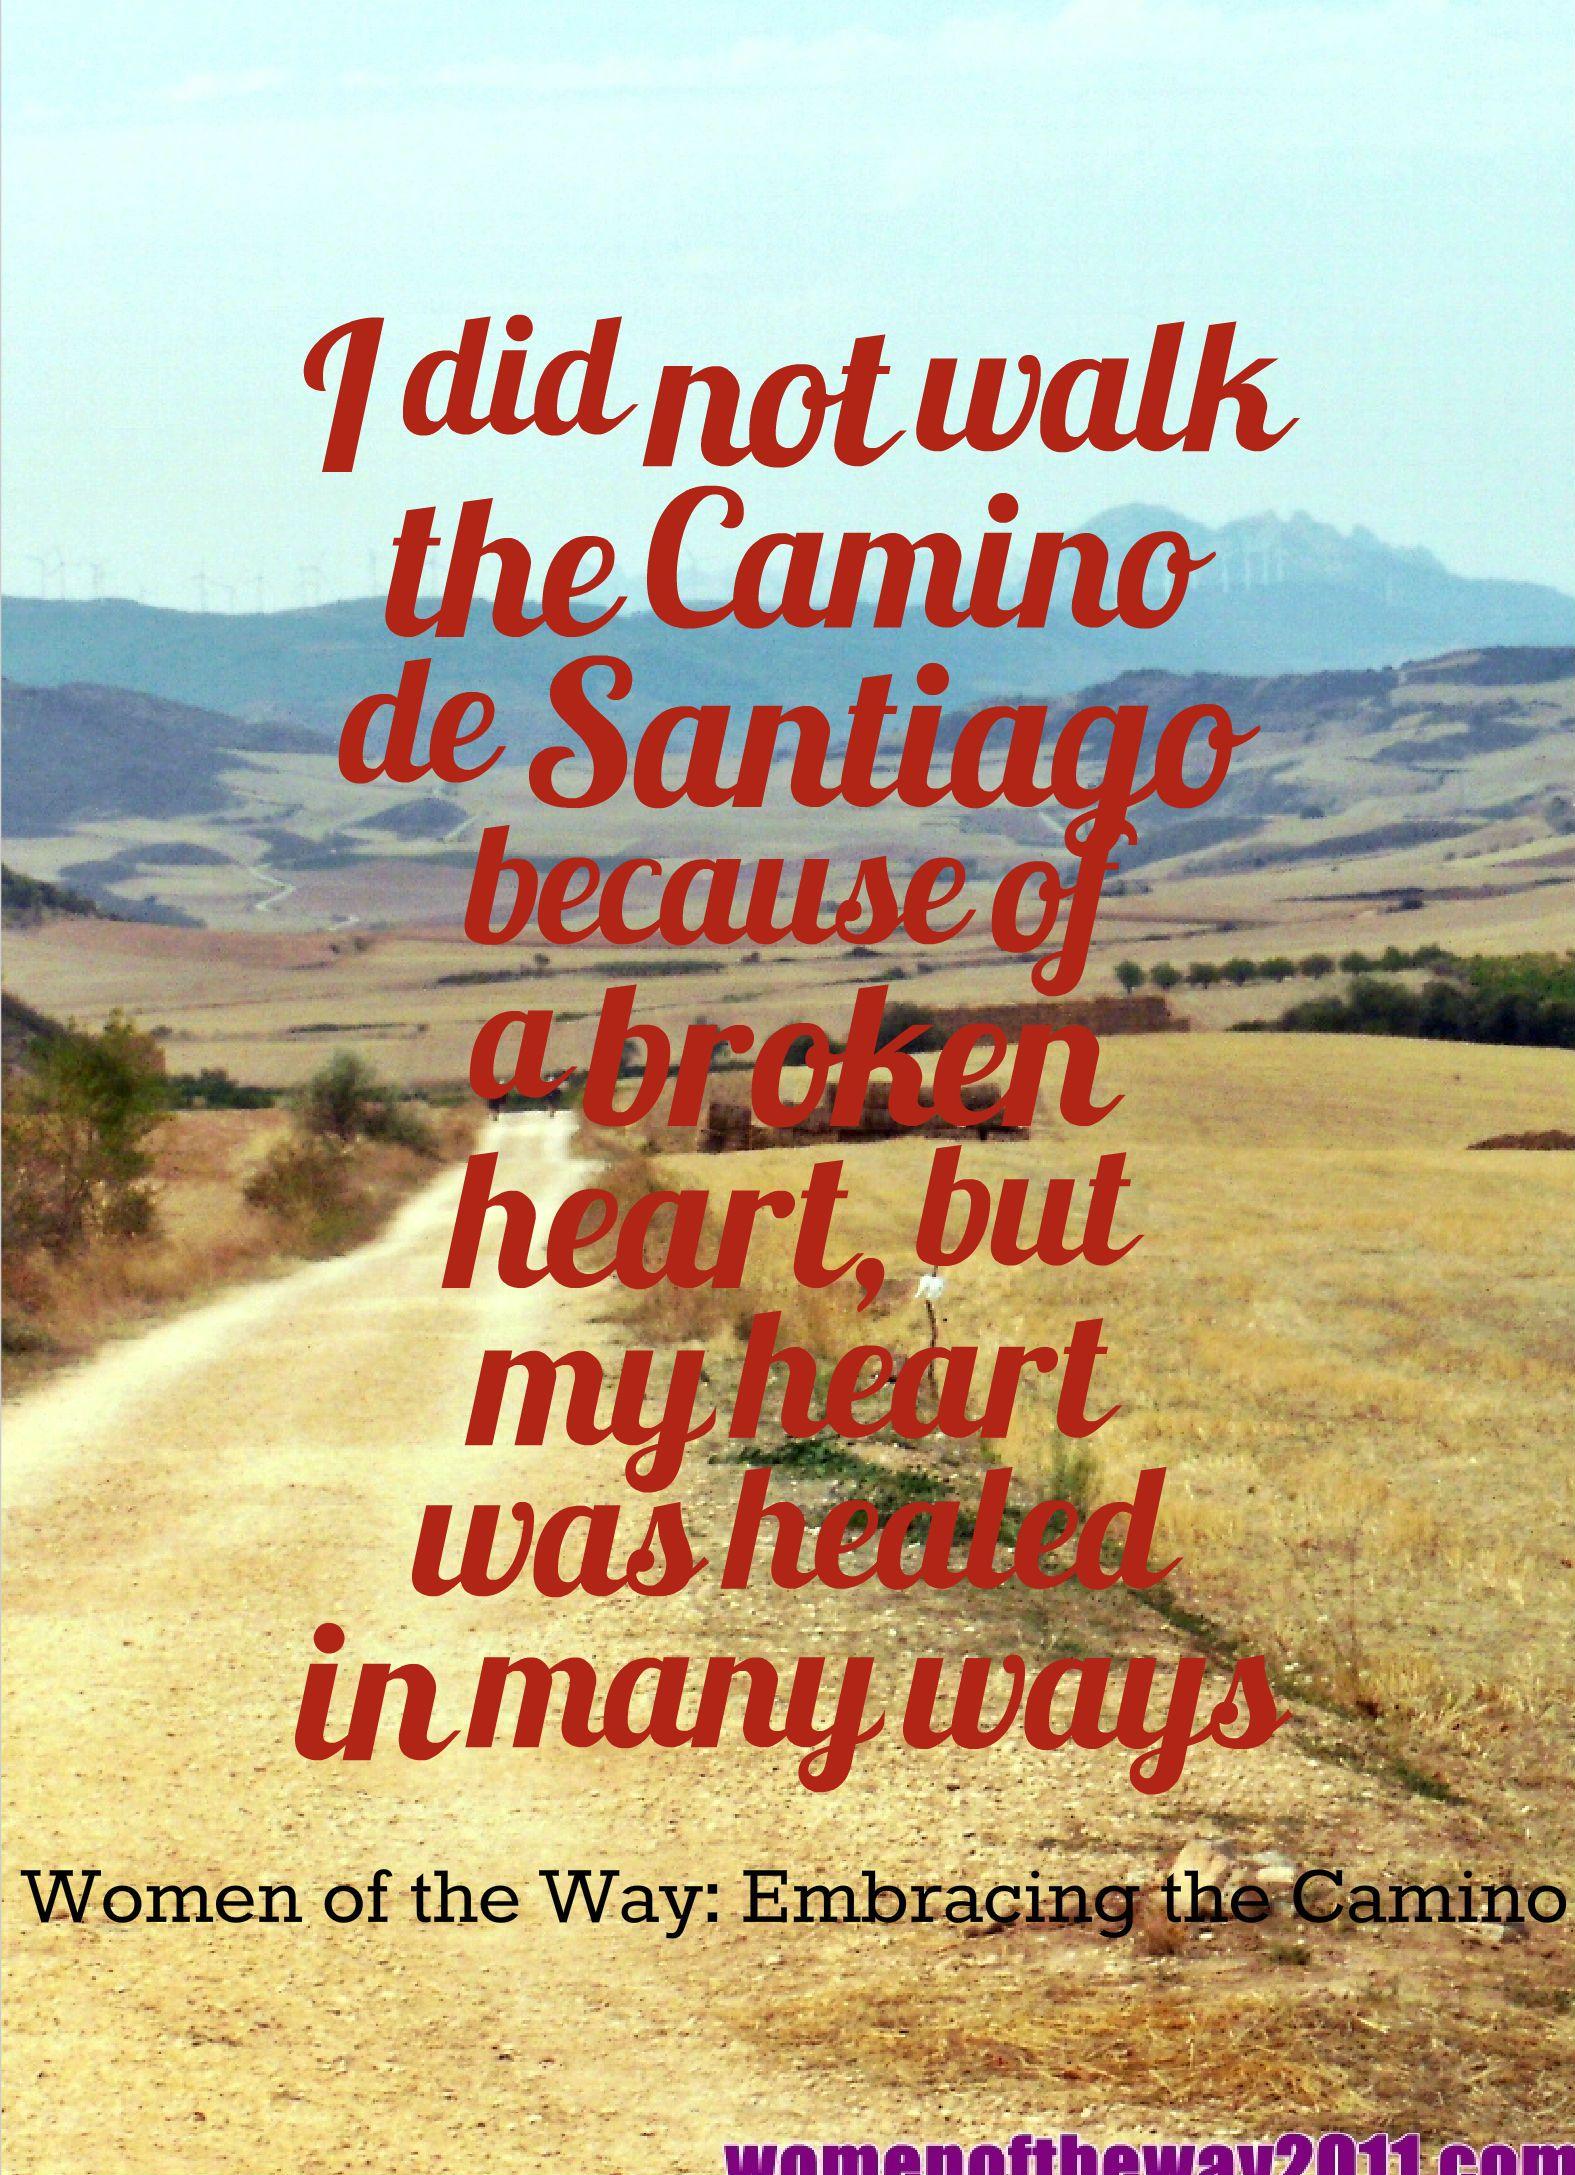 1ce49d5b456a I did not walk the Camino de Santiago because of a broken heart